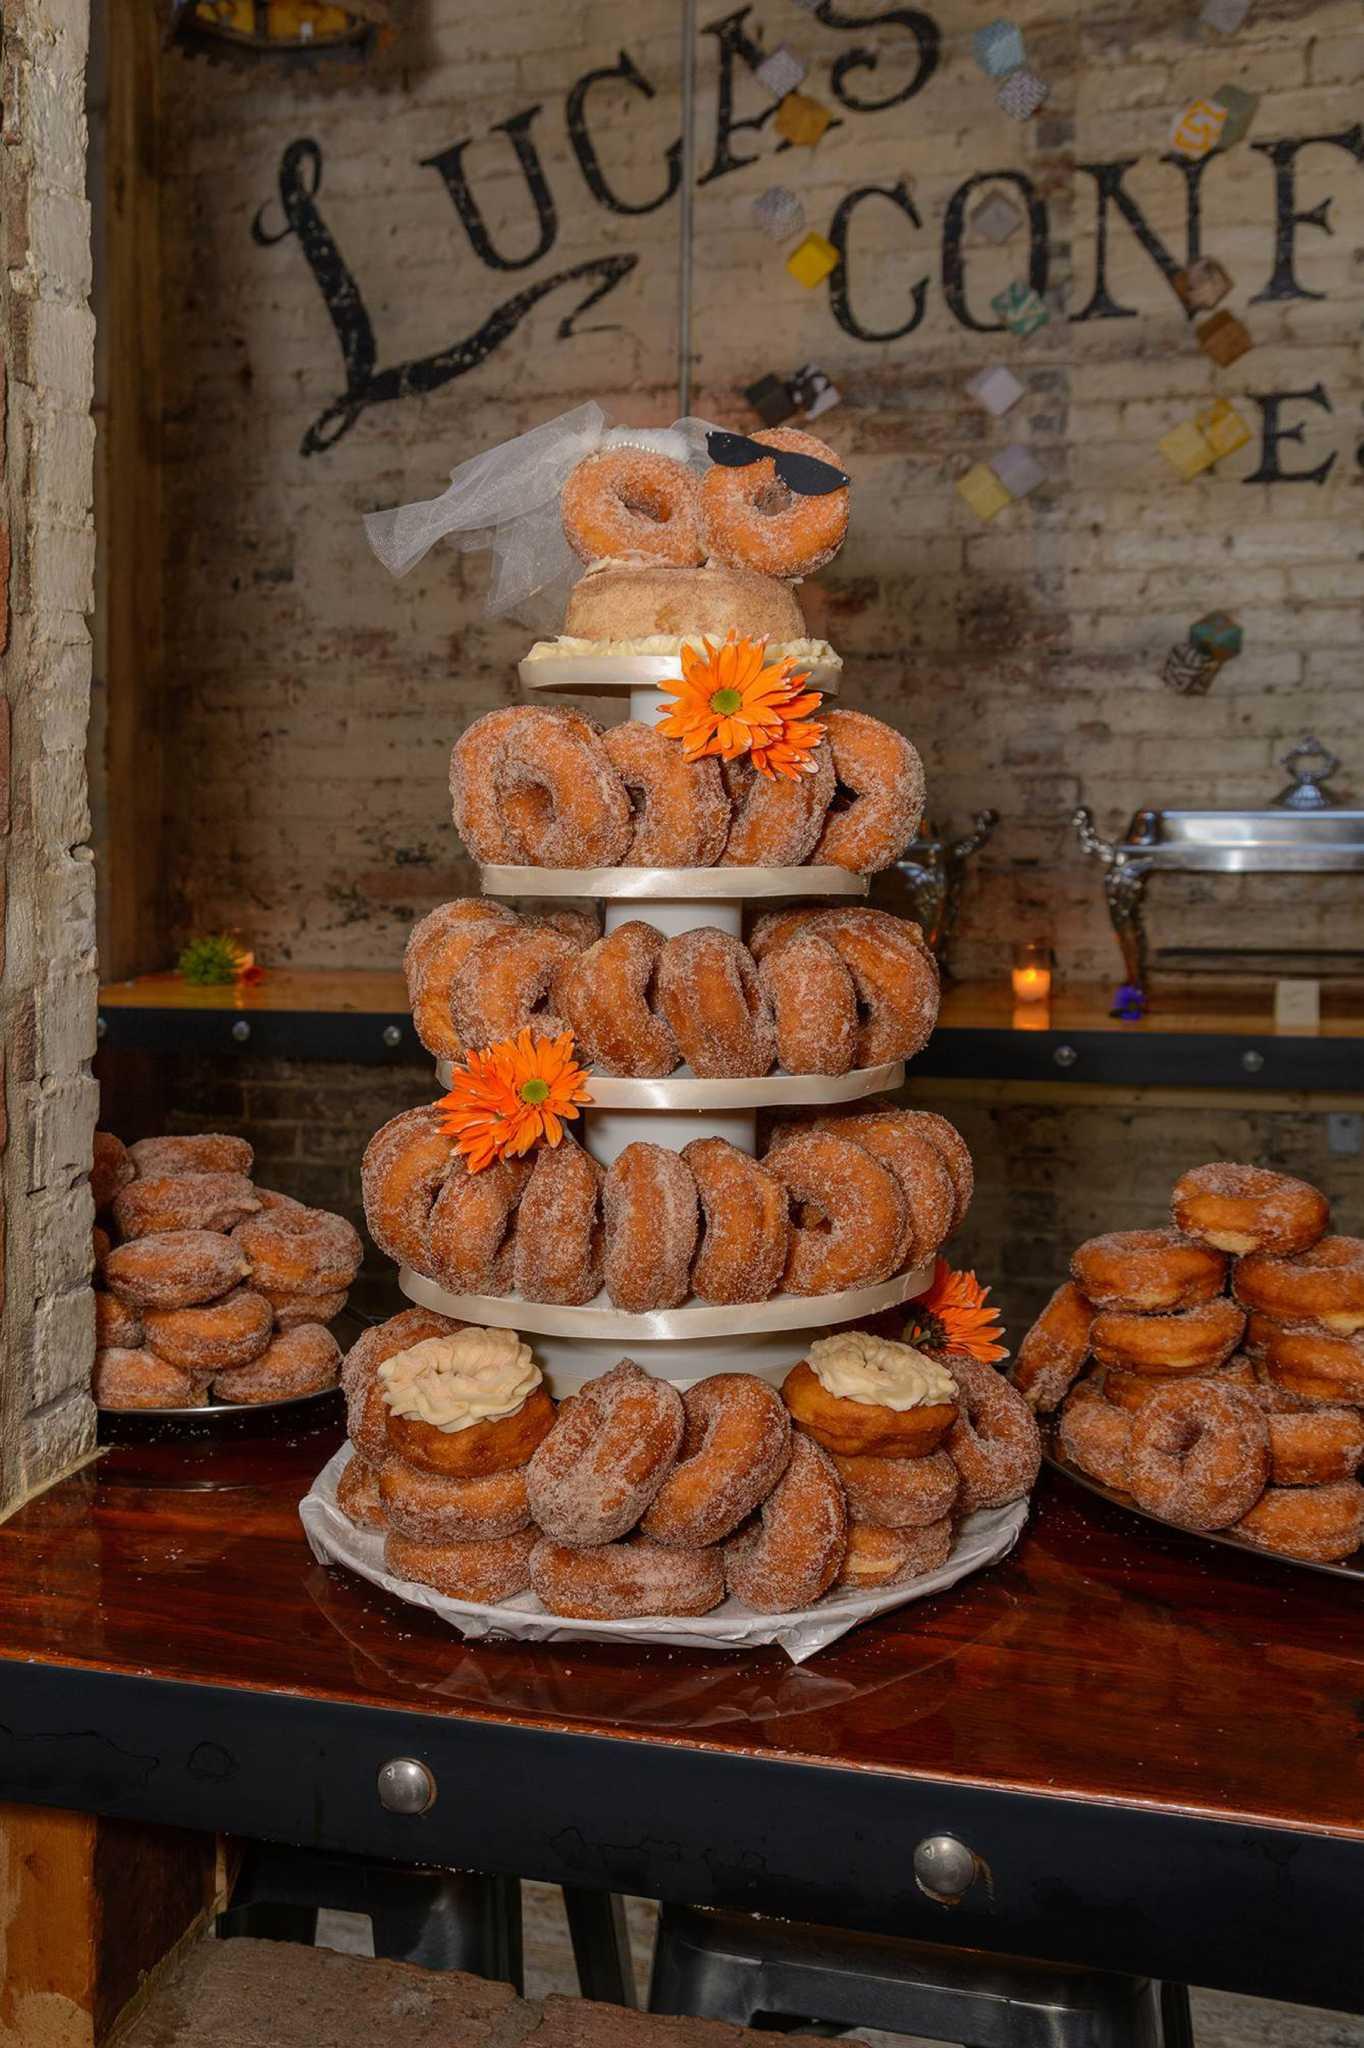 Donut Wedding Cake.Doughnut Wedding Cake A Creation To Cherish Times Union